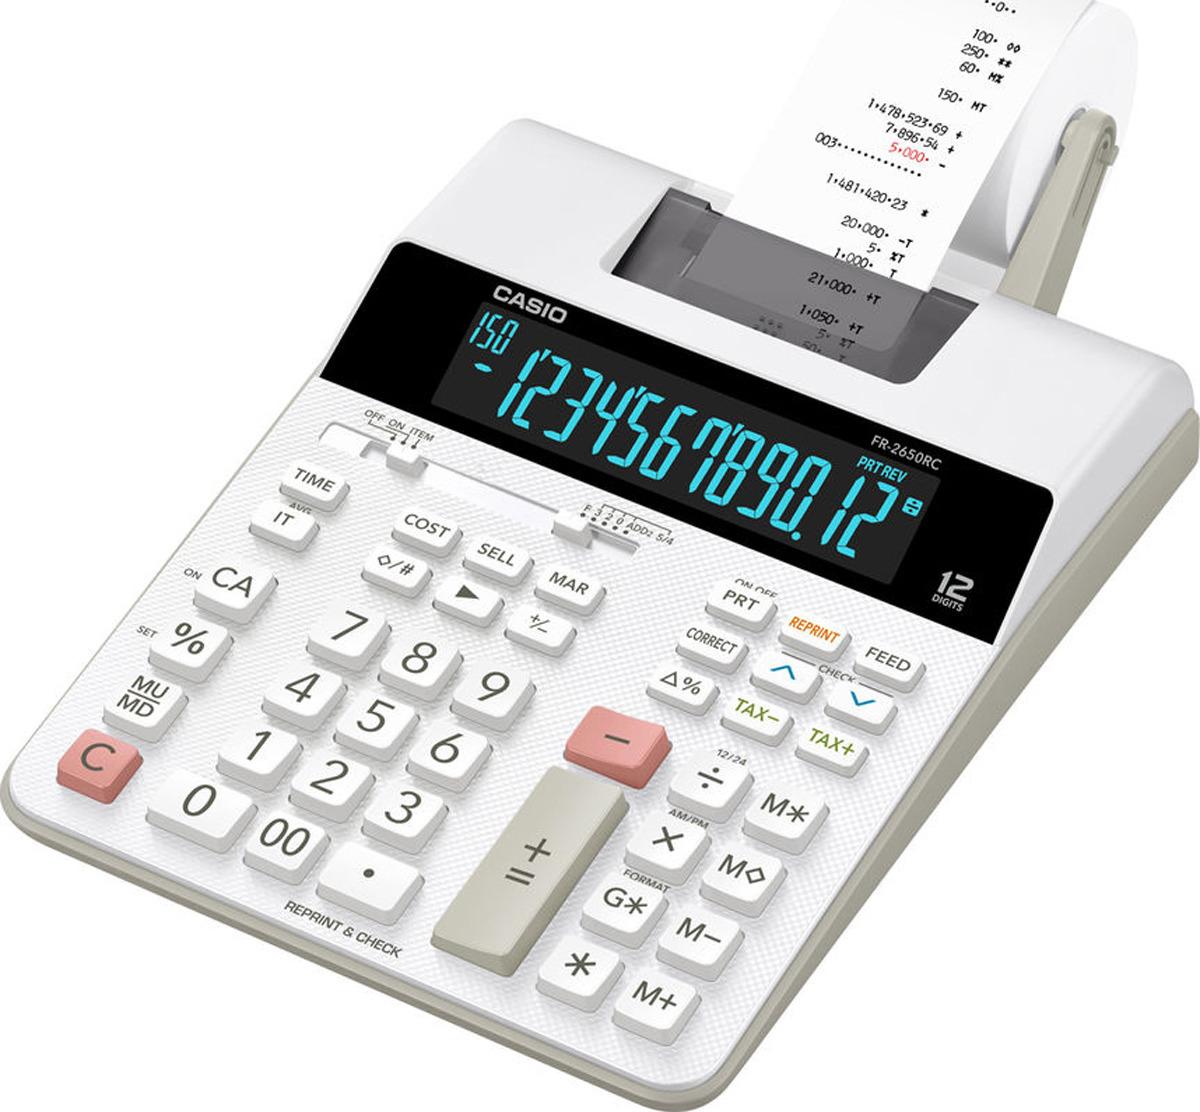 Калькулятор с печатью Casio, серый, белый, FR-2650RC-W-EC цены онлайн